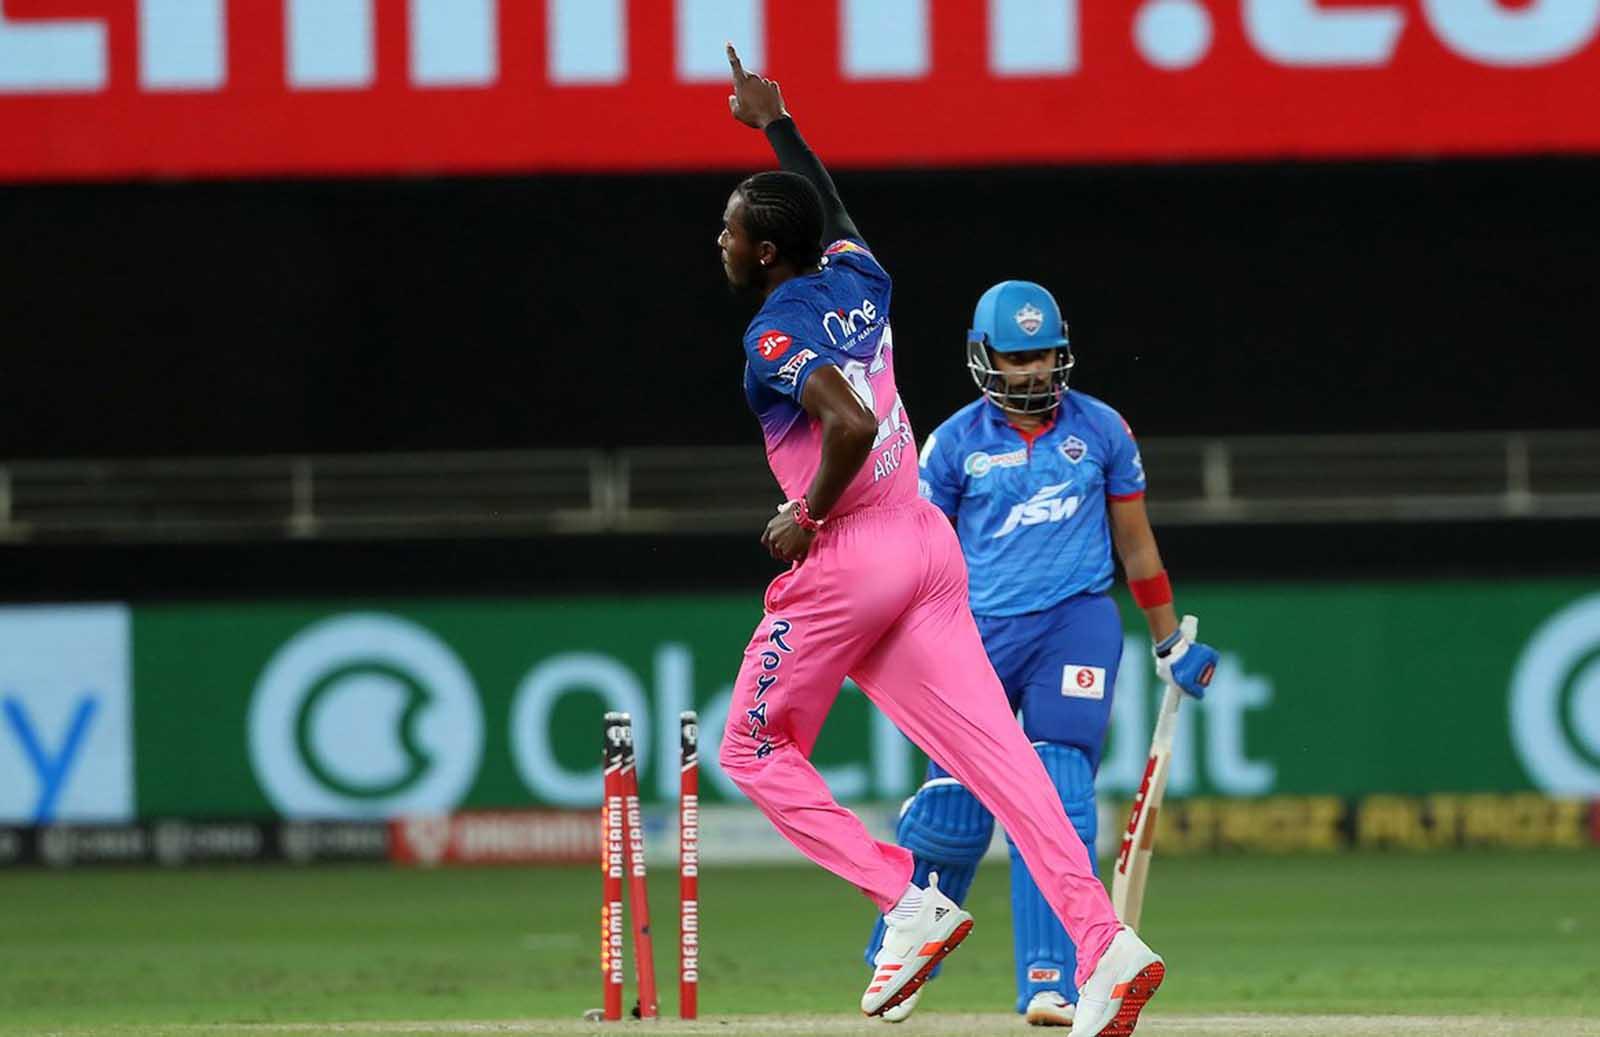 Jofra Archer Celebrates Prithvi Shaw's Wicket With Bihu Dance Against DC